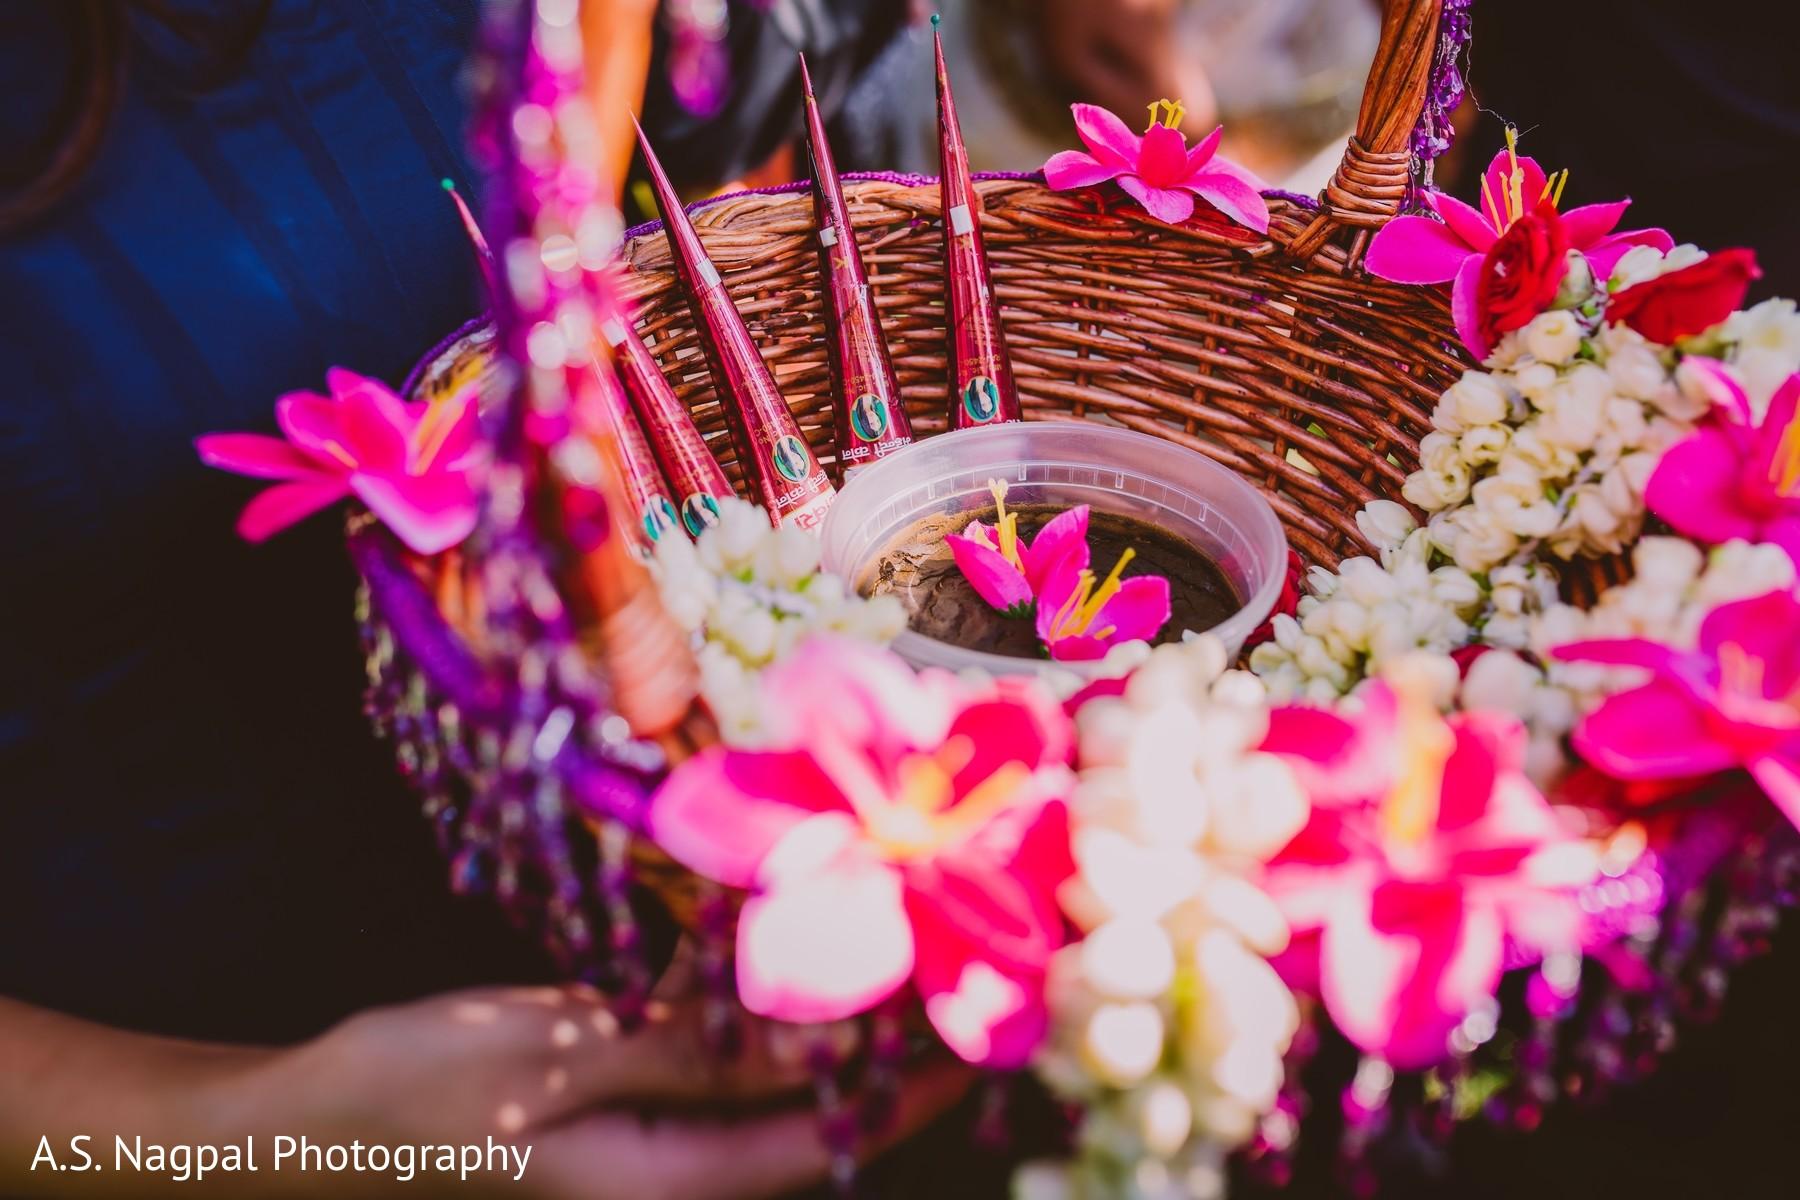 Mehndi Party Bags : Mehndi celebration in princeton nj indian wedding by a s nagpal